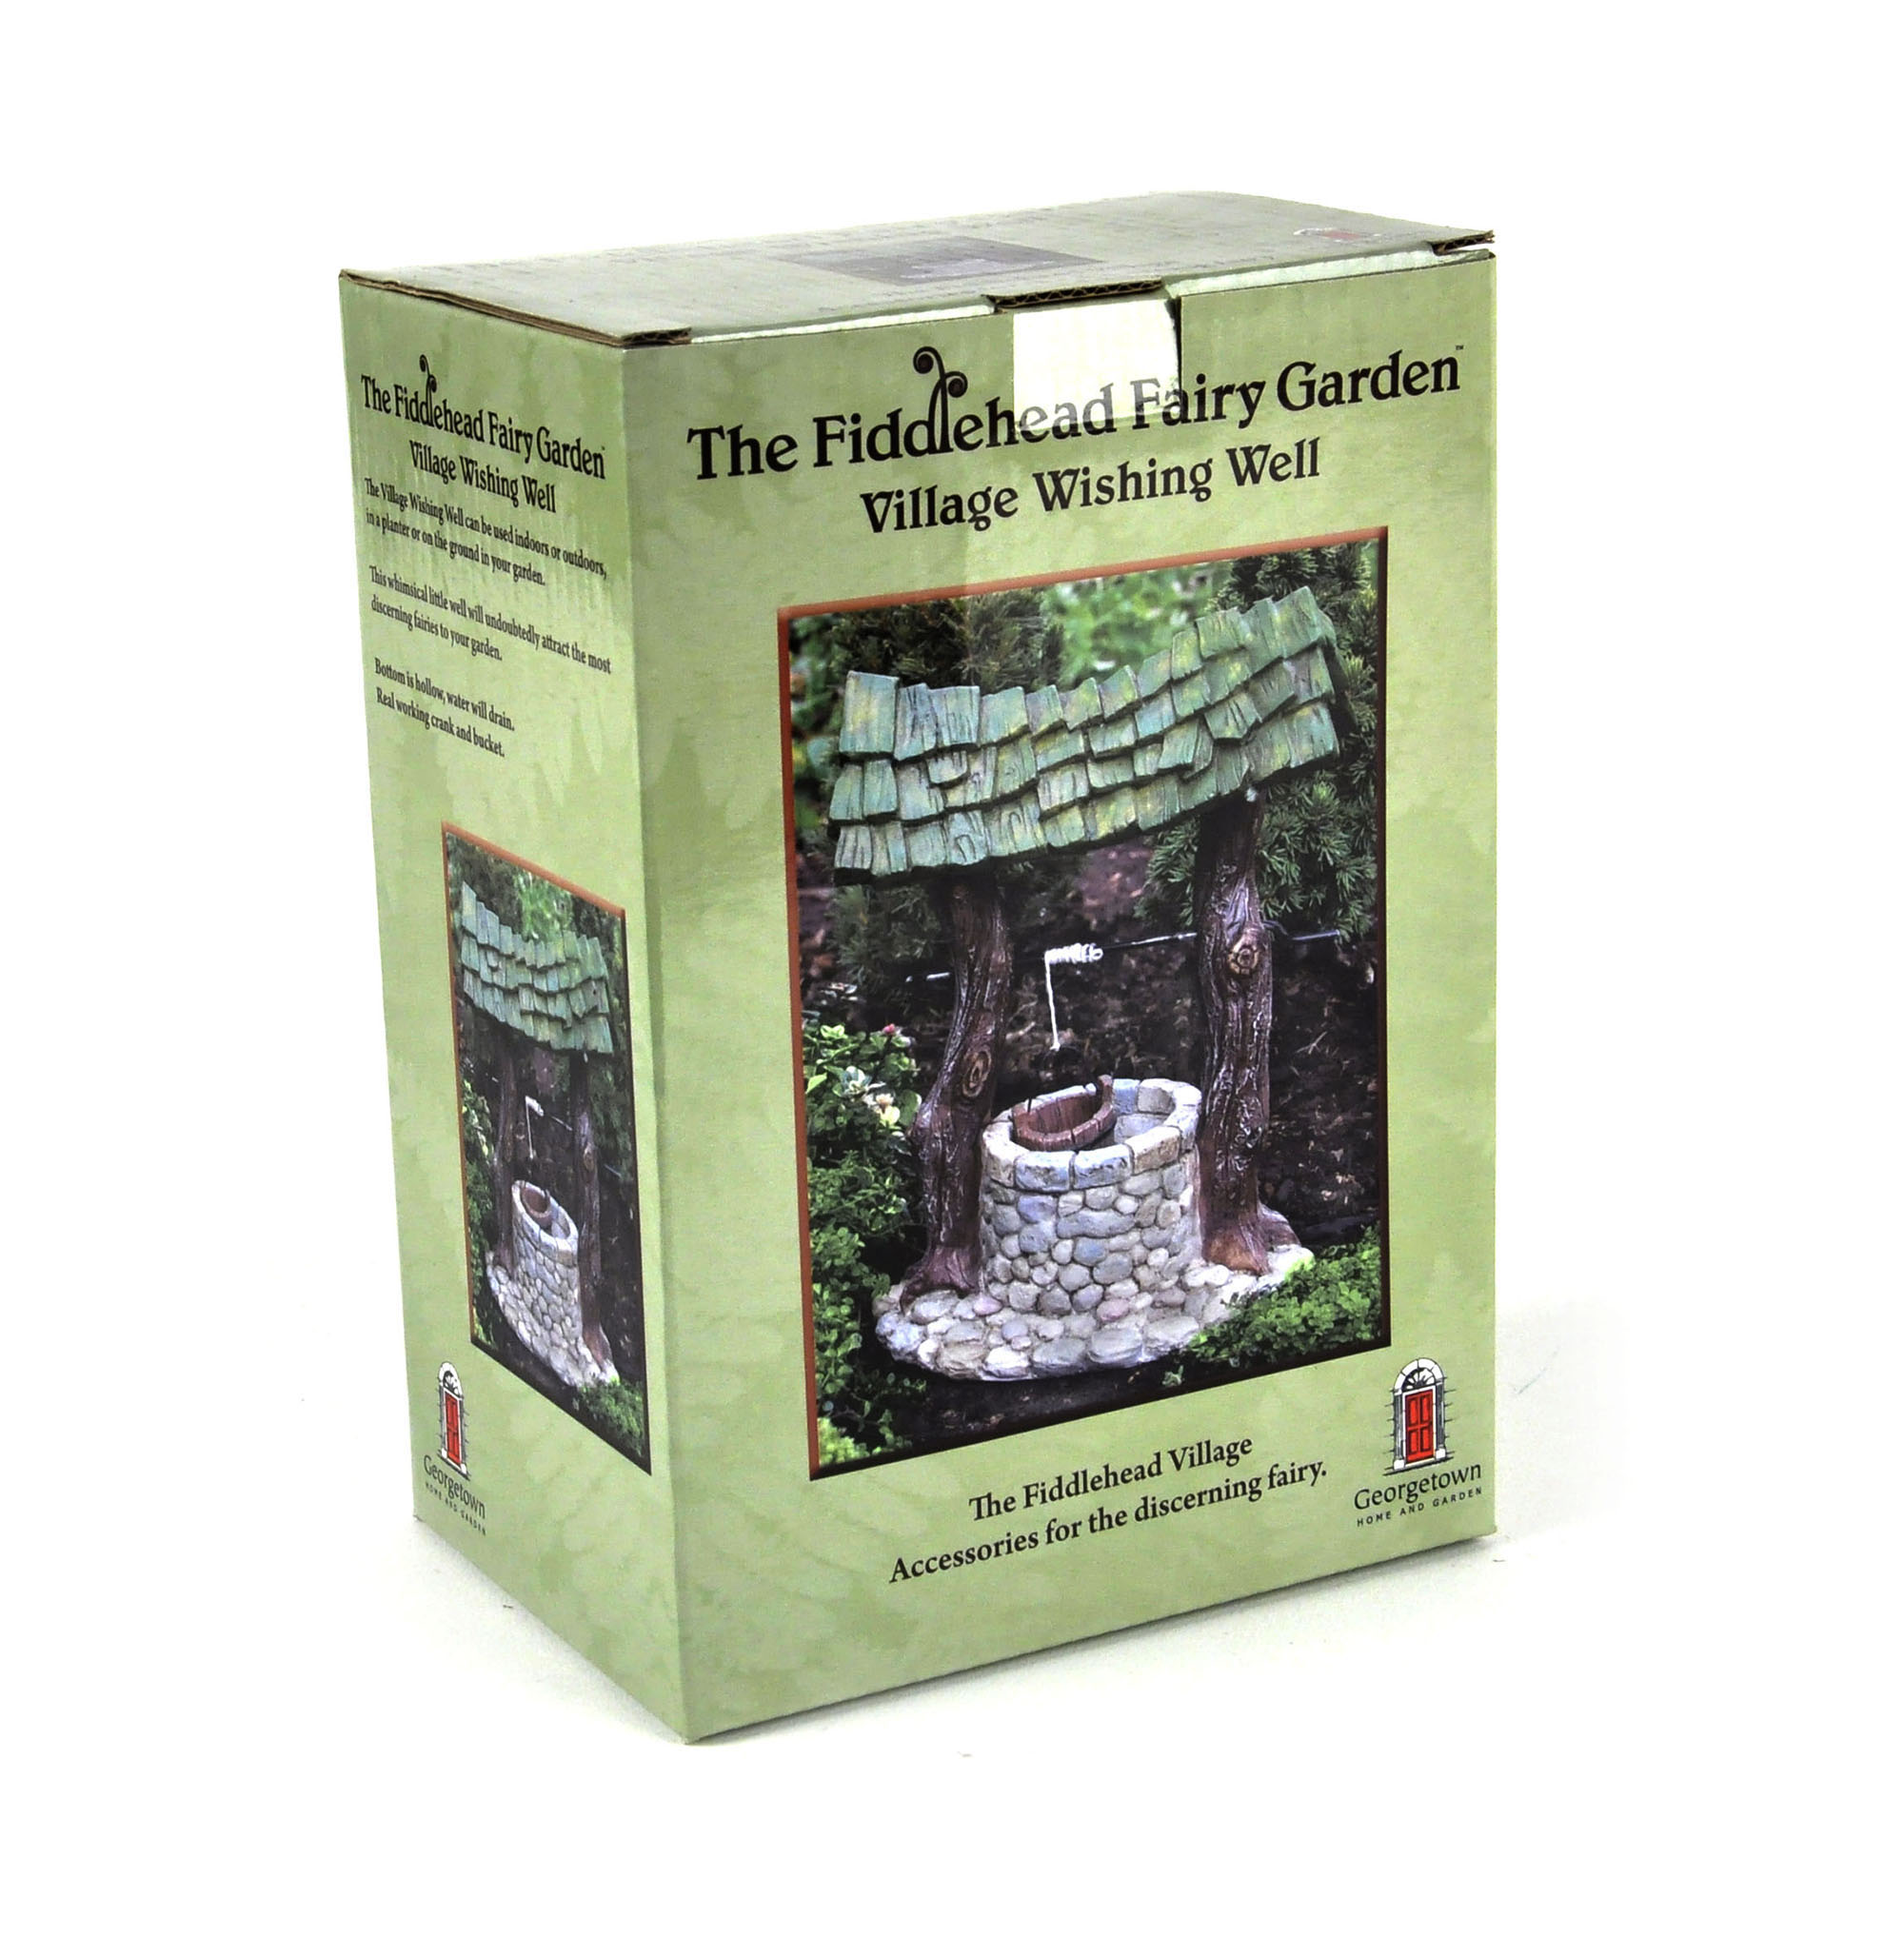 Fairy Village Wishing Well - Fiddlehead Fairy Garden Collection ...